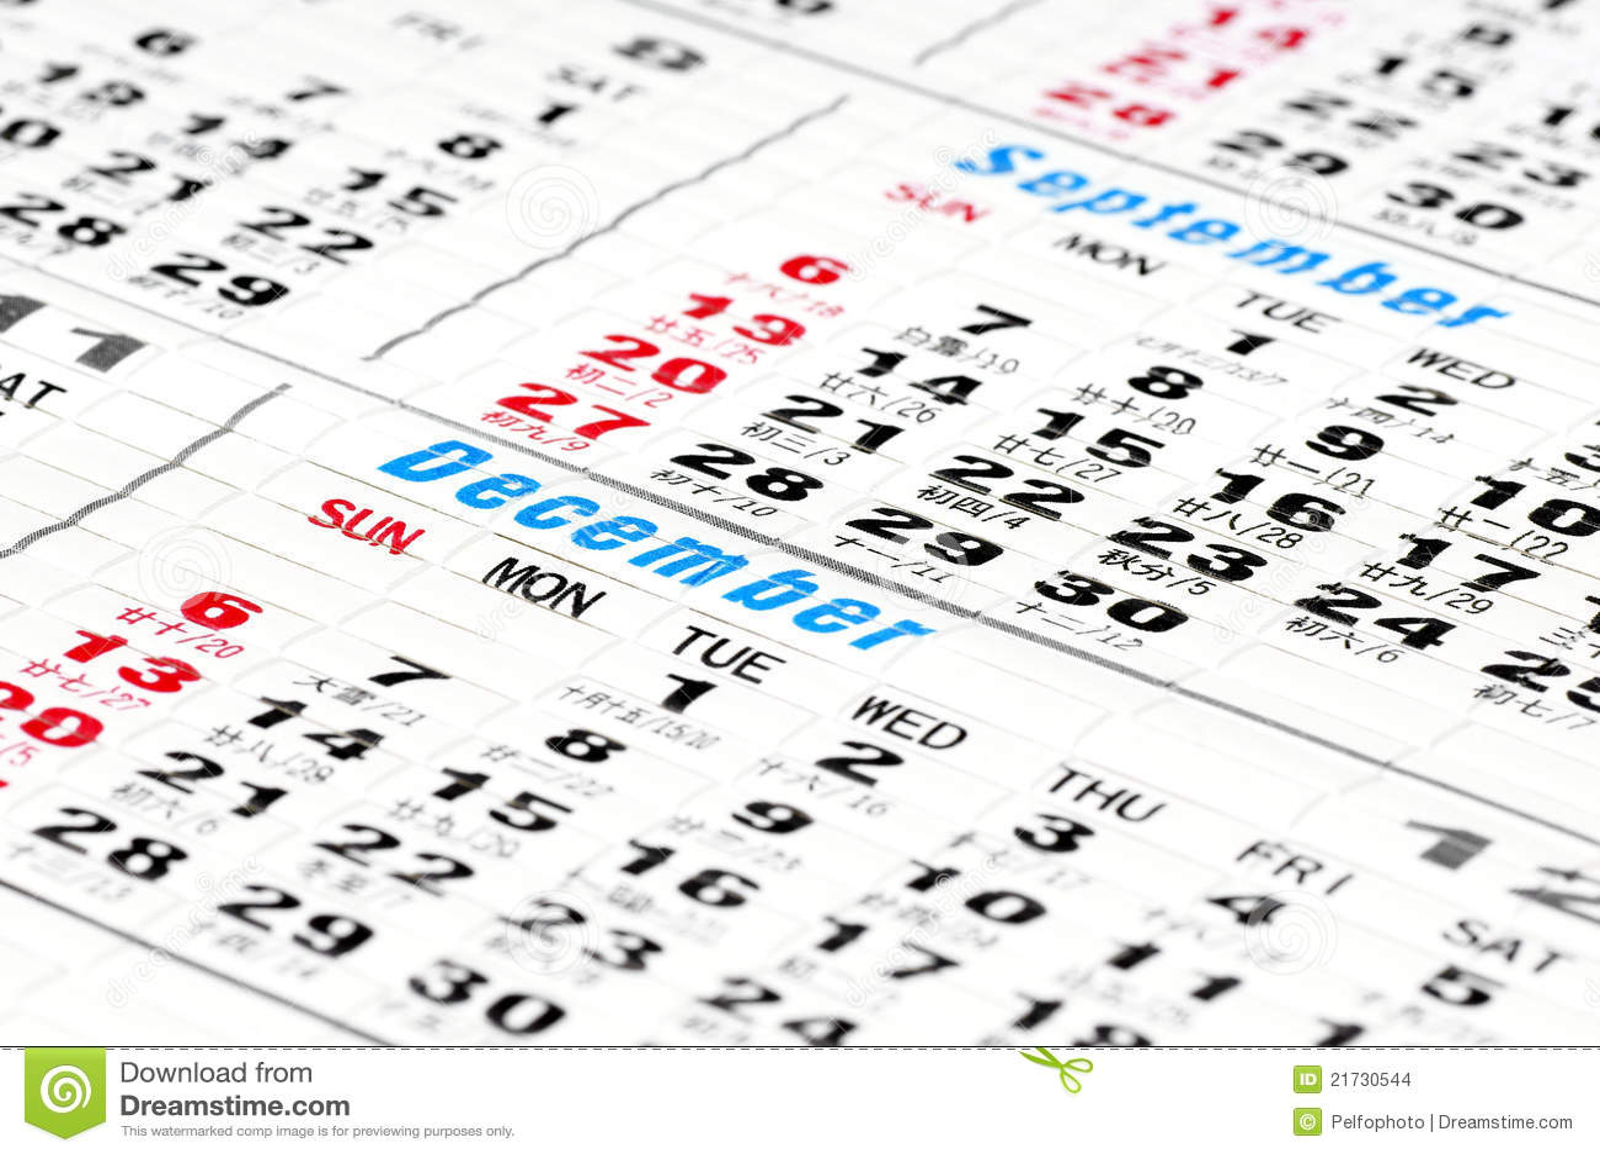 Calendar Days. Stock Images - Image: 21730544